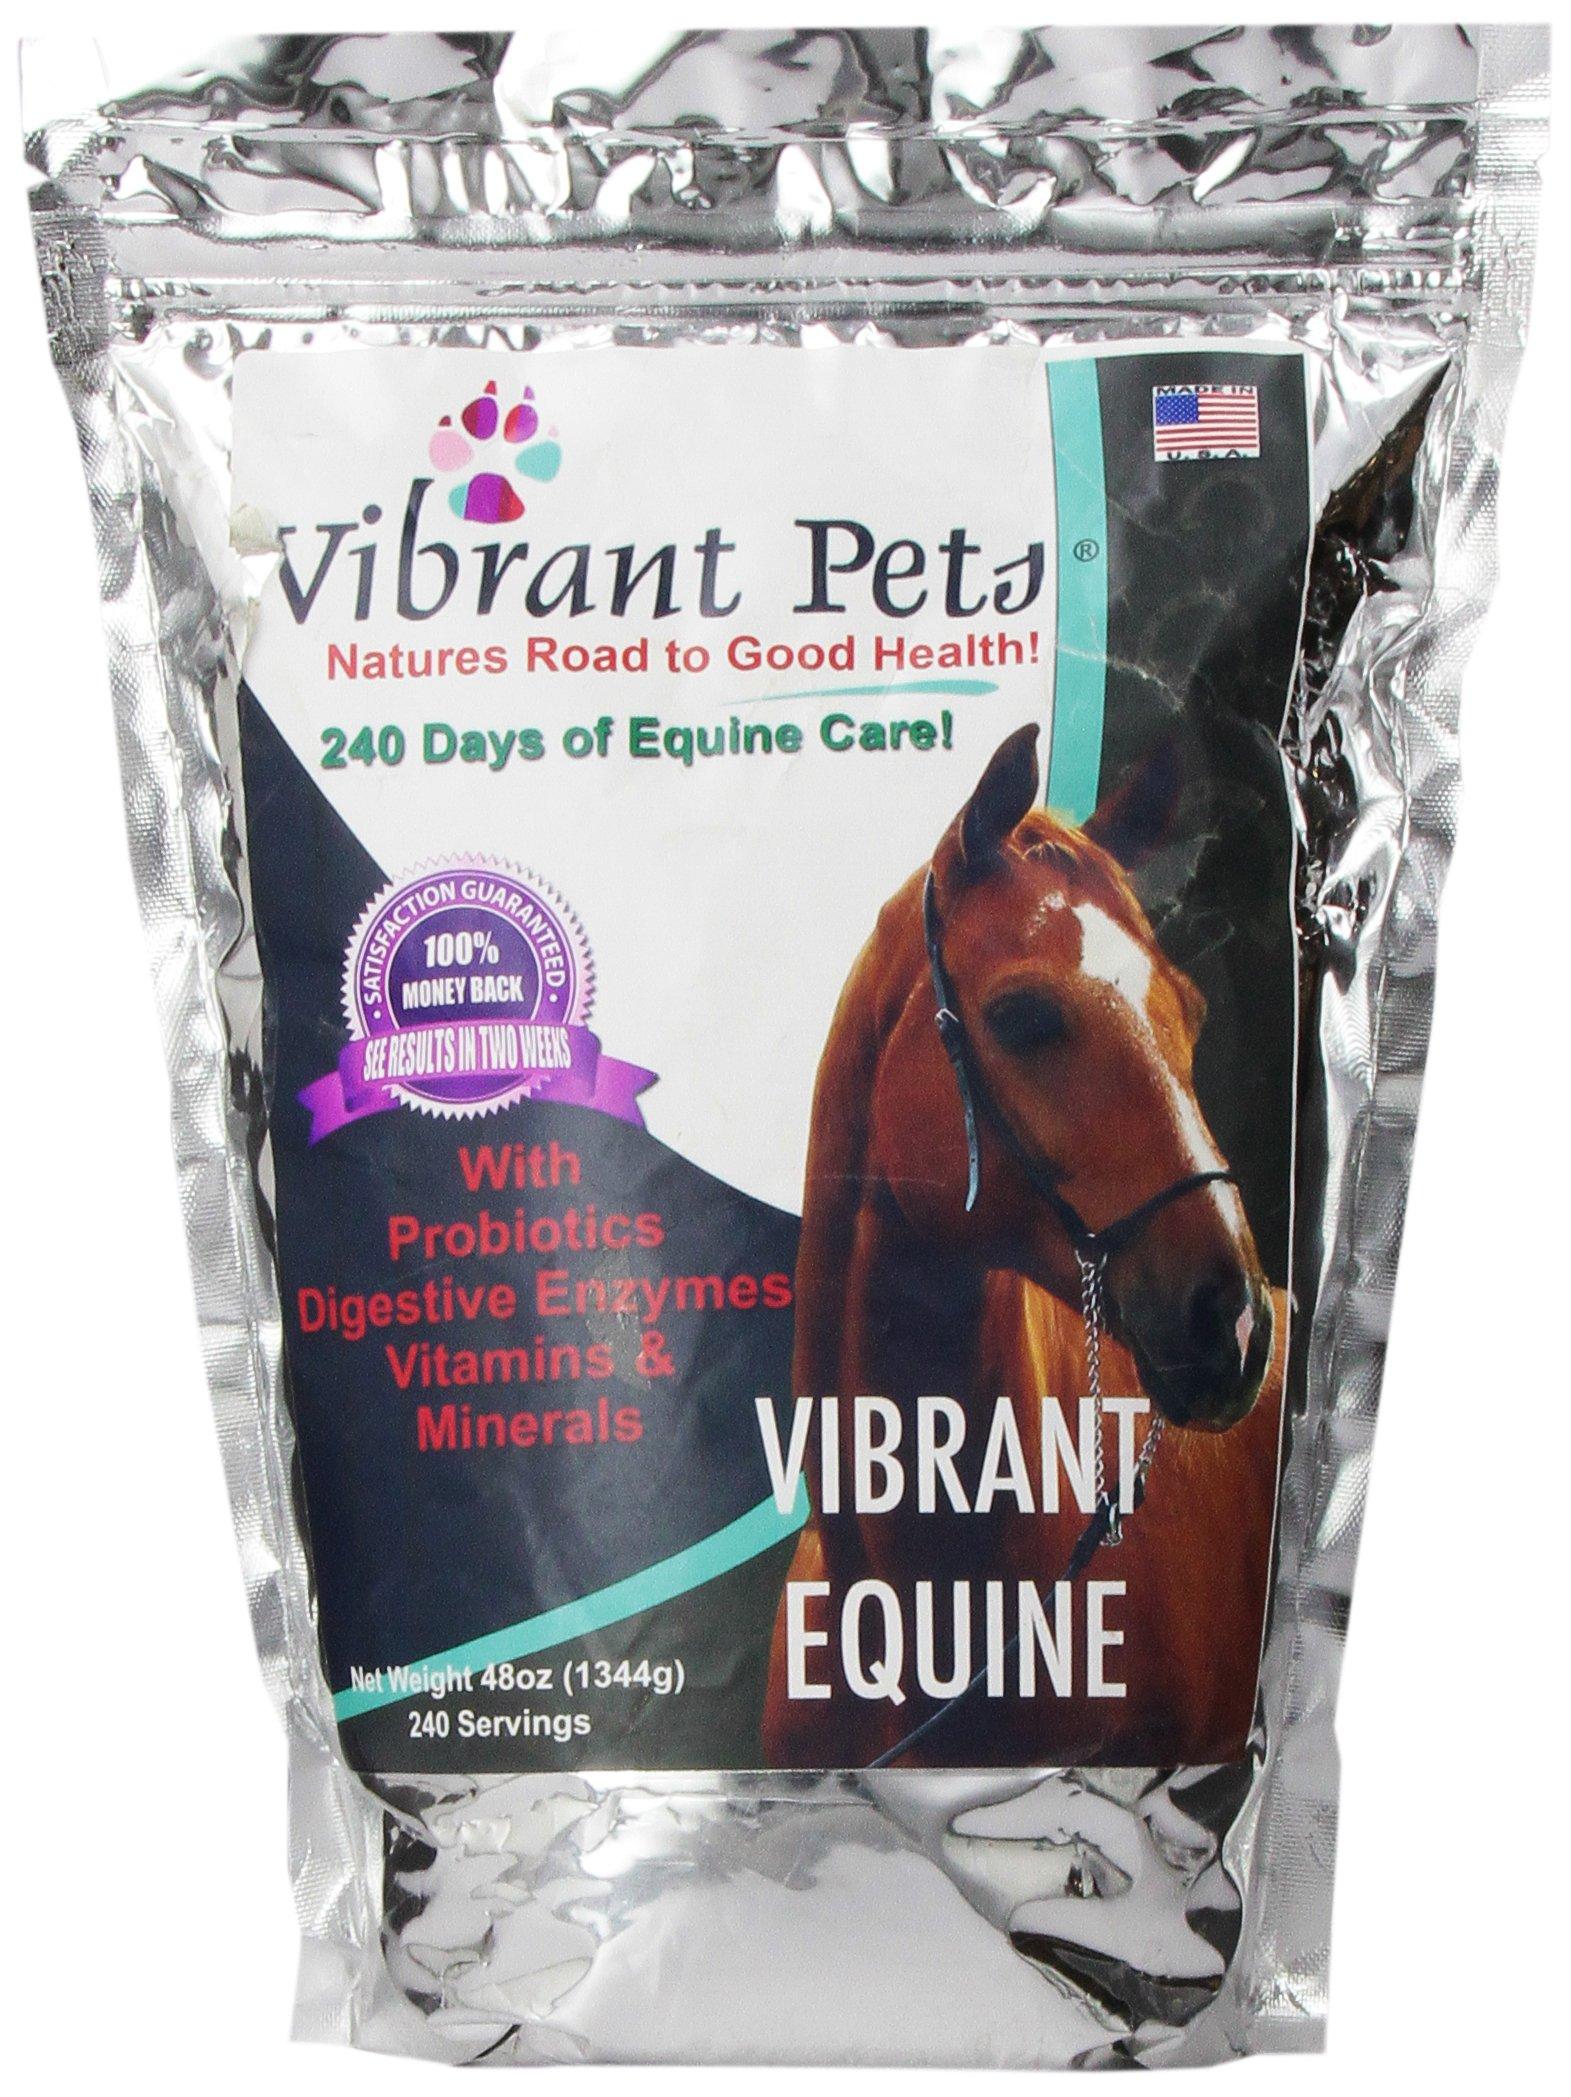 Vibrant Pets VE48 Vibrant Equine, 48 oz. by Vibrant Pets